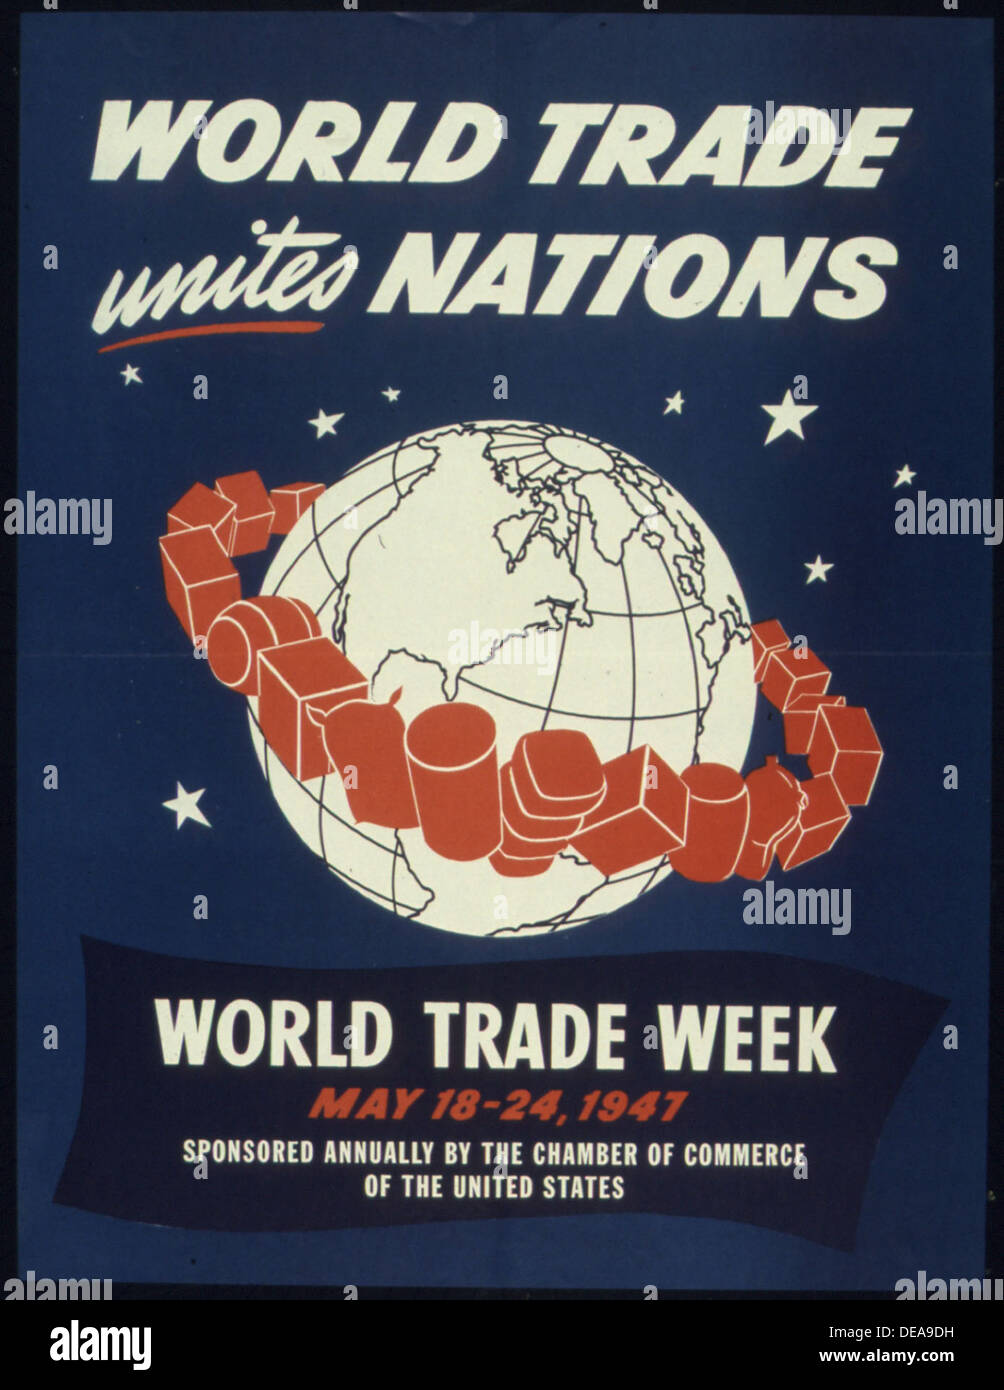 WORLD TRADE UNITES NATIONS 516195 - Stock Image